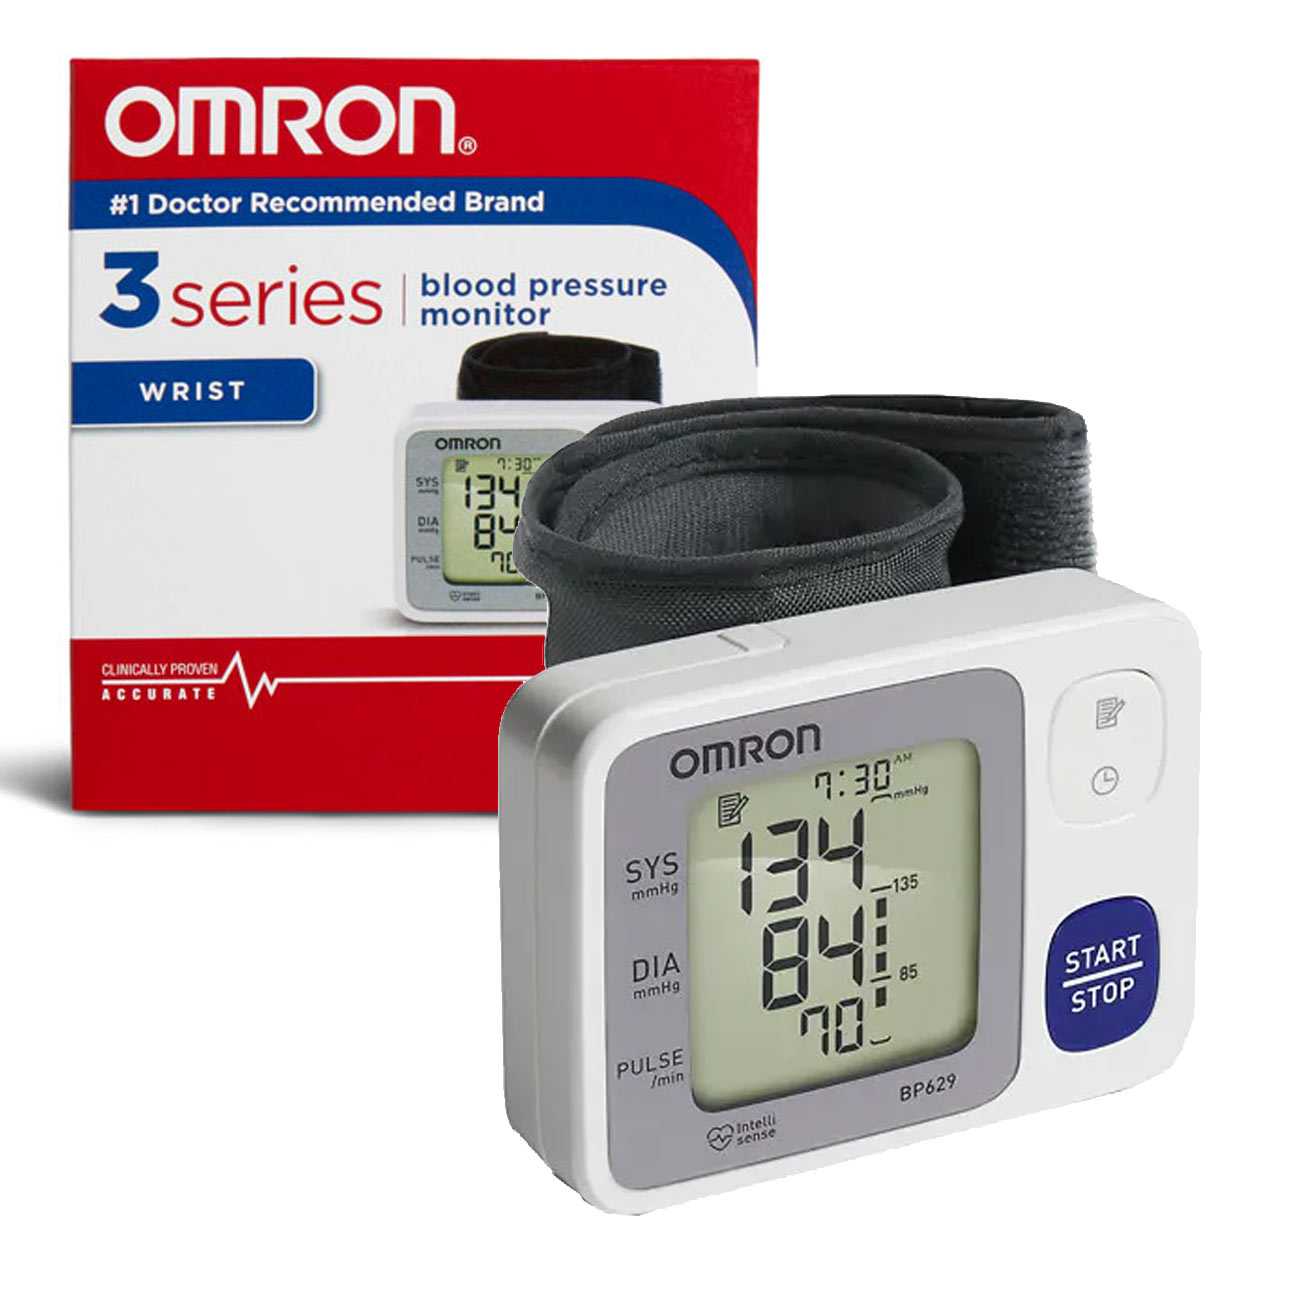 Omron Auto-Inflating Wrist Blood Pressure Monitor Price: $65.95